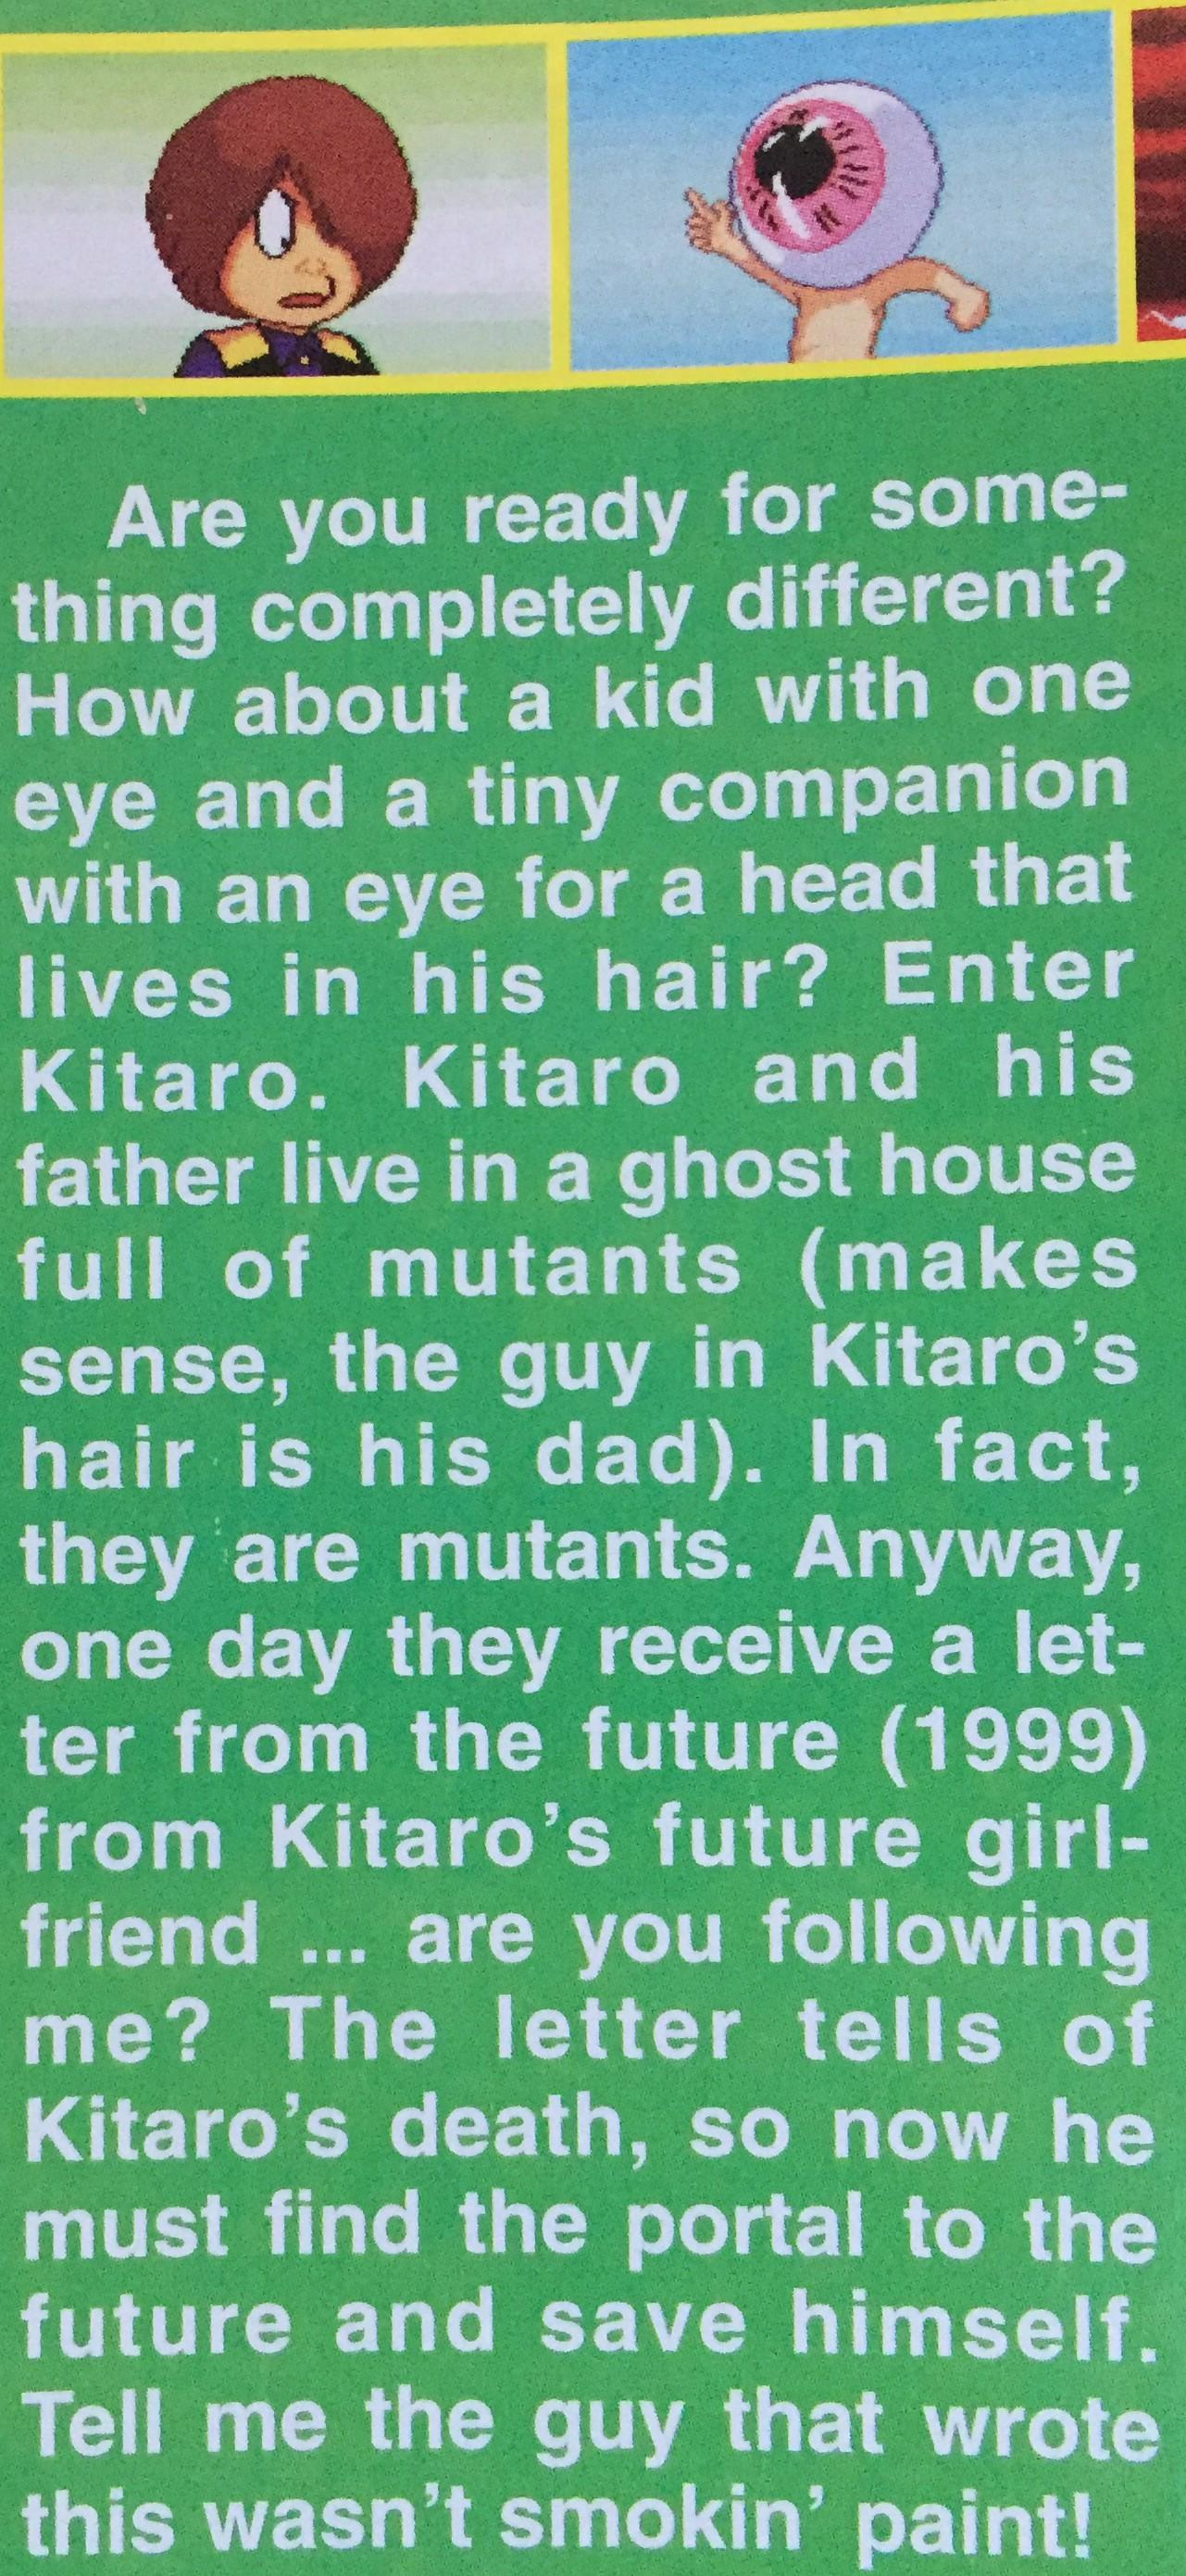 Hey, don't slander Shigeru Mizuki's good name!